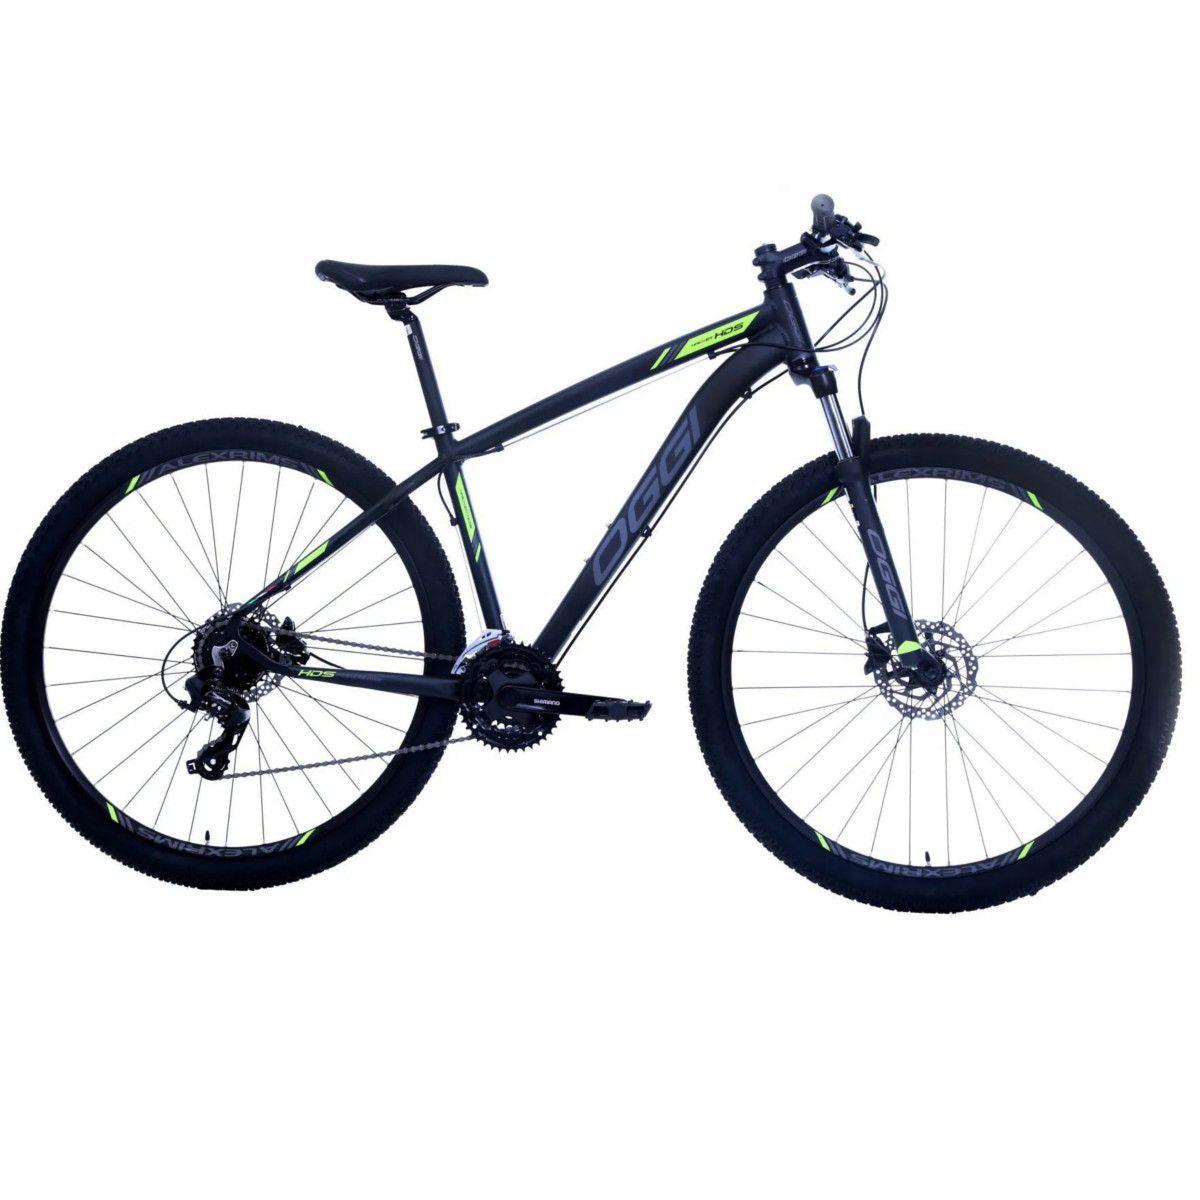 Bicicleta Oggi Hacker HDS aro 29 24v  Hidraulico Verde.